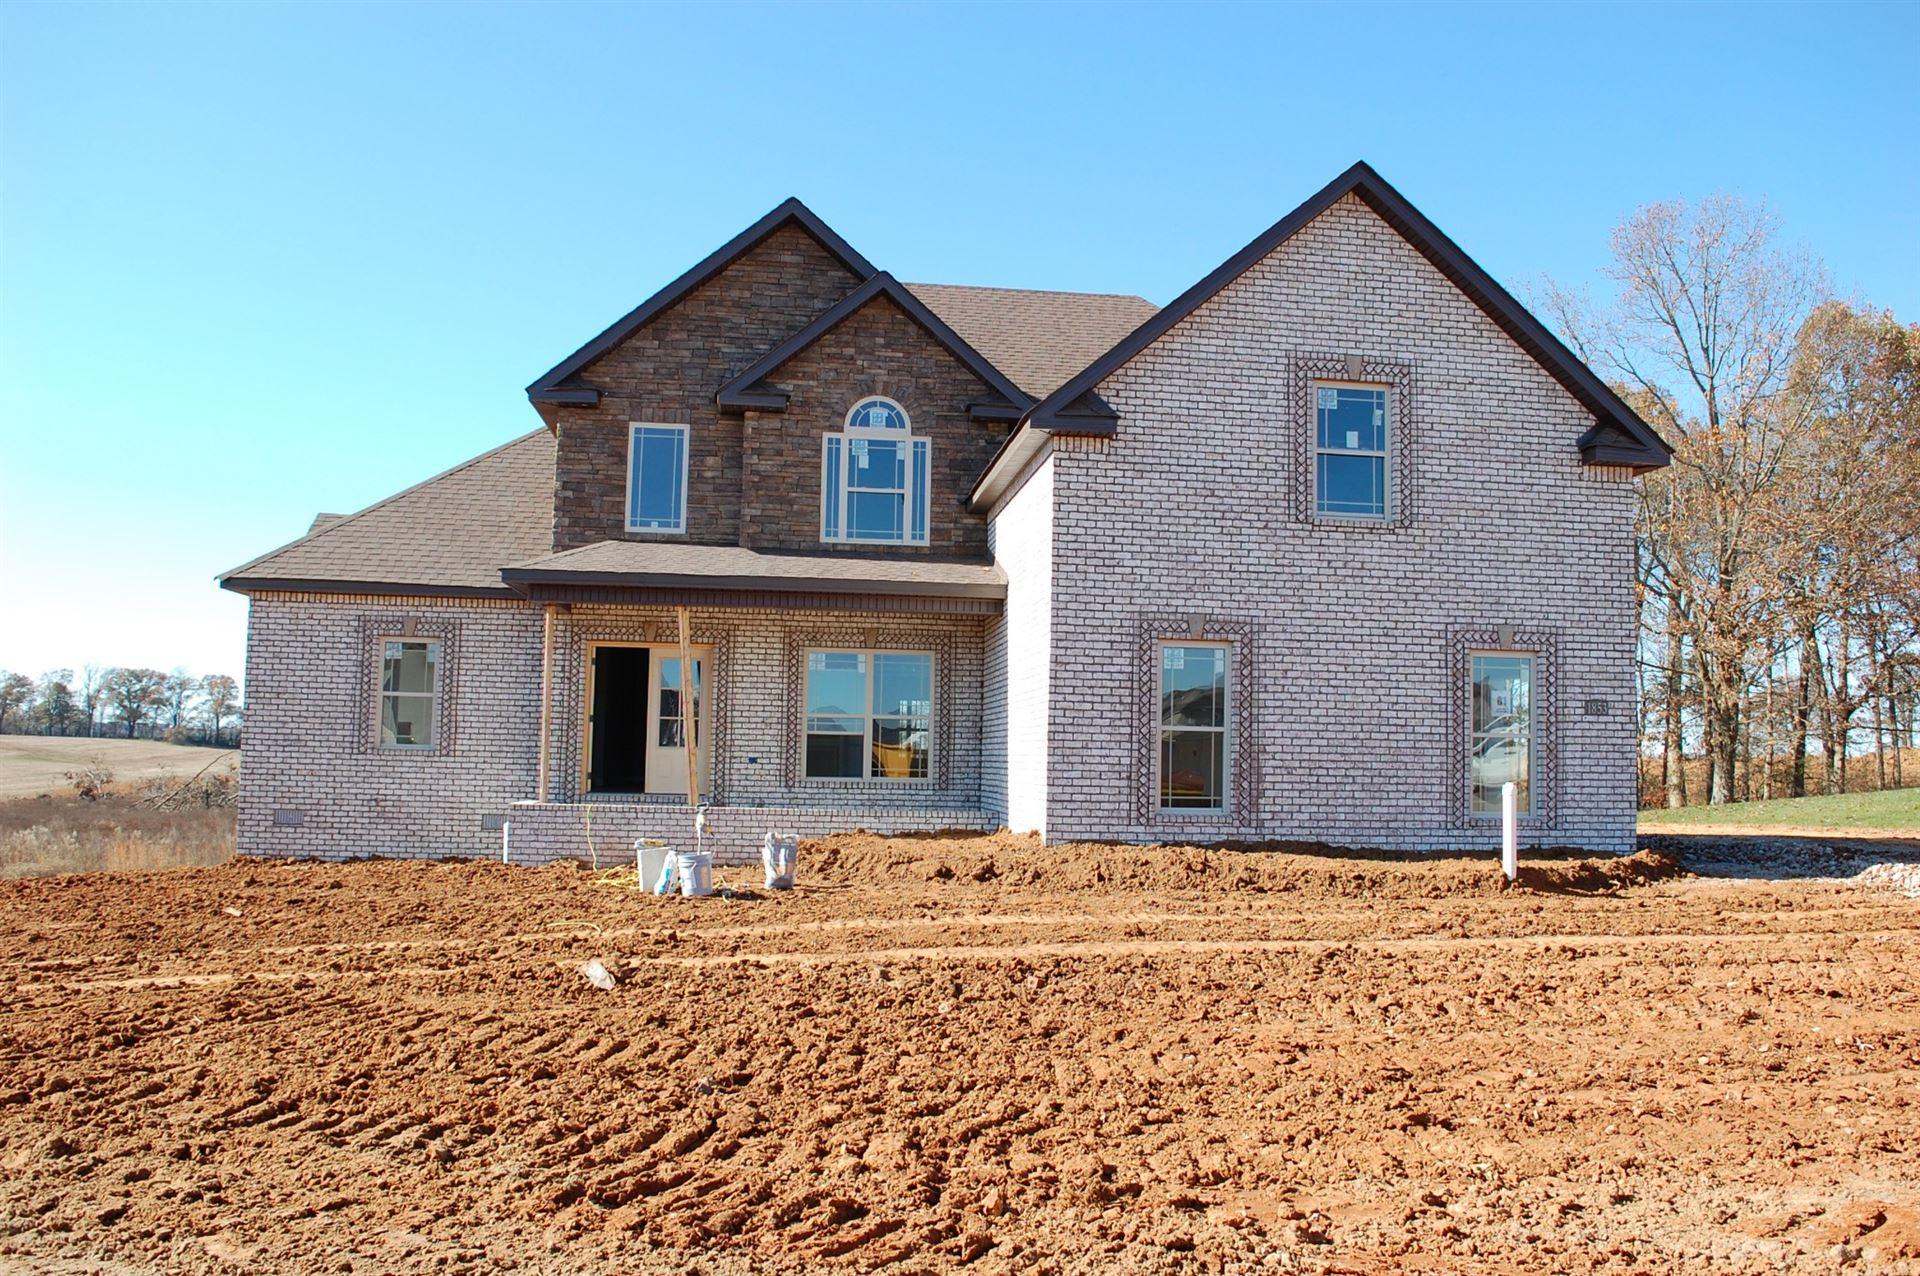 81 Hartley Hills, Clarksville, TN 37043 - MLS#: 2188364